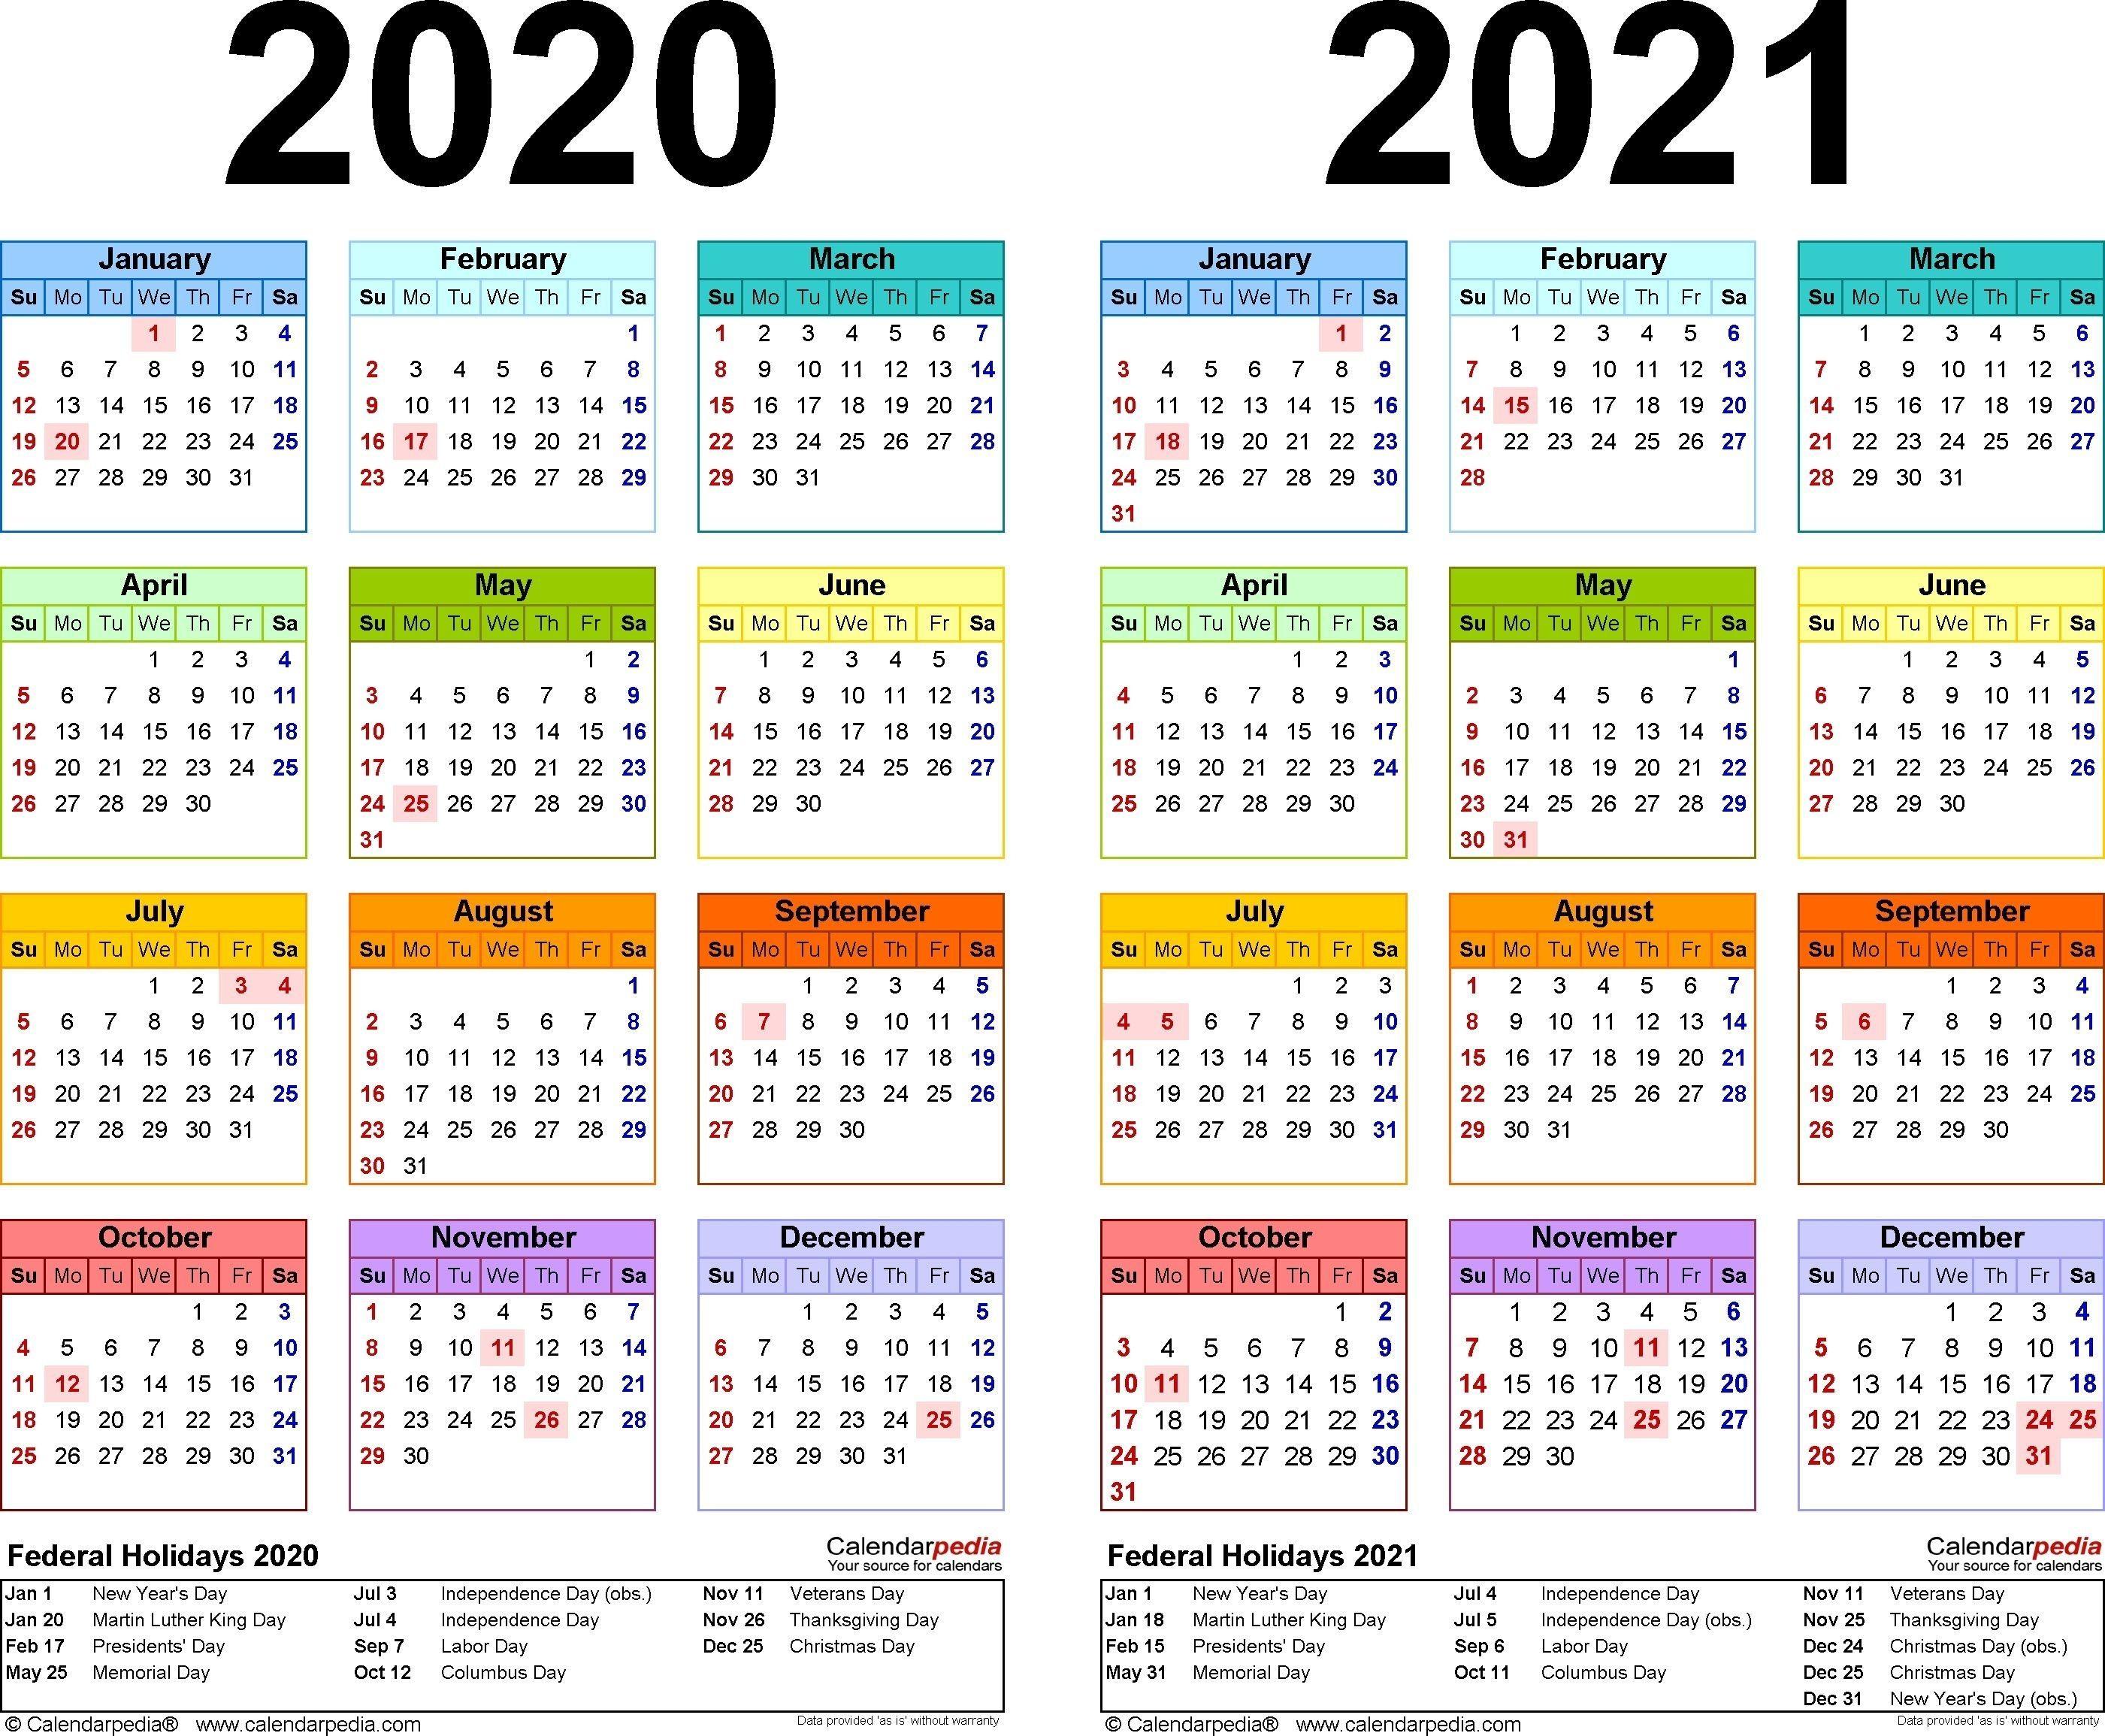 U Of A Academic Calendar 2021 U Of T 2020 2021 Academic Calendar | Excel calendar, Calendar